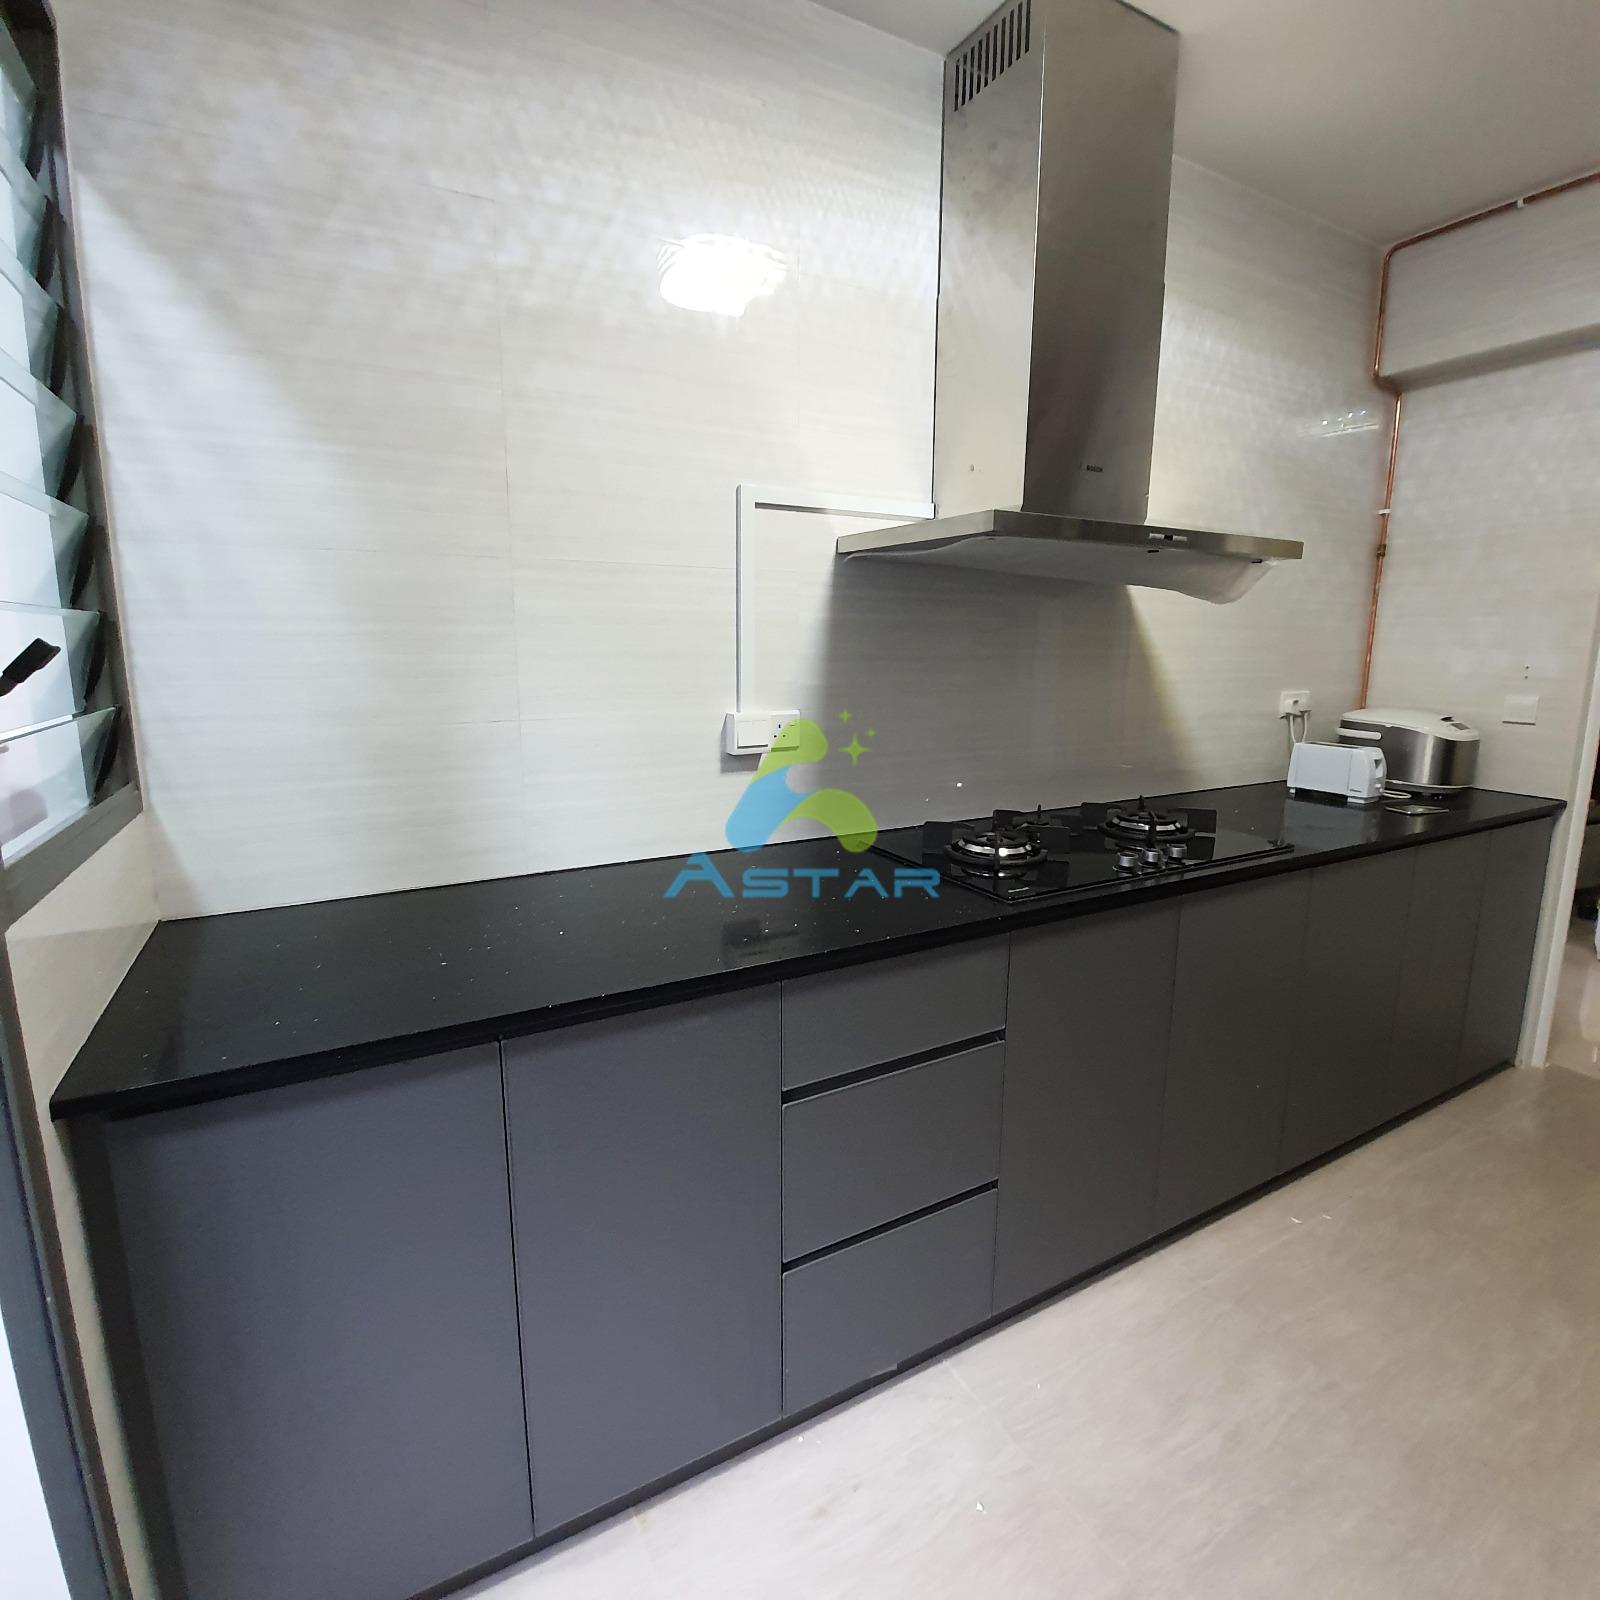 a star furnishing projects Blk 478A Yishun St 44 02